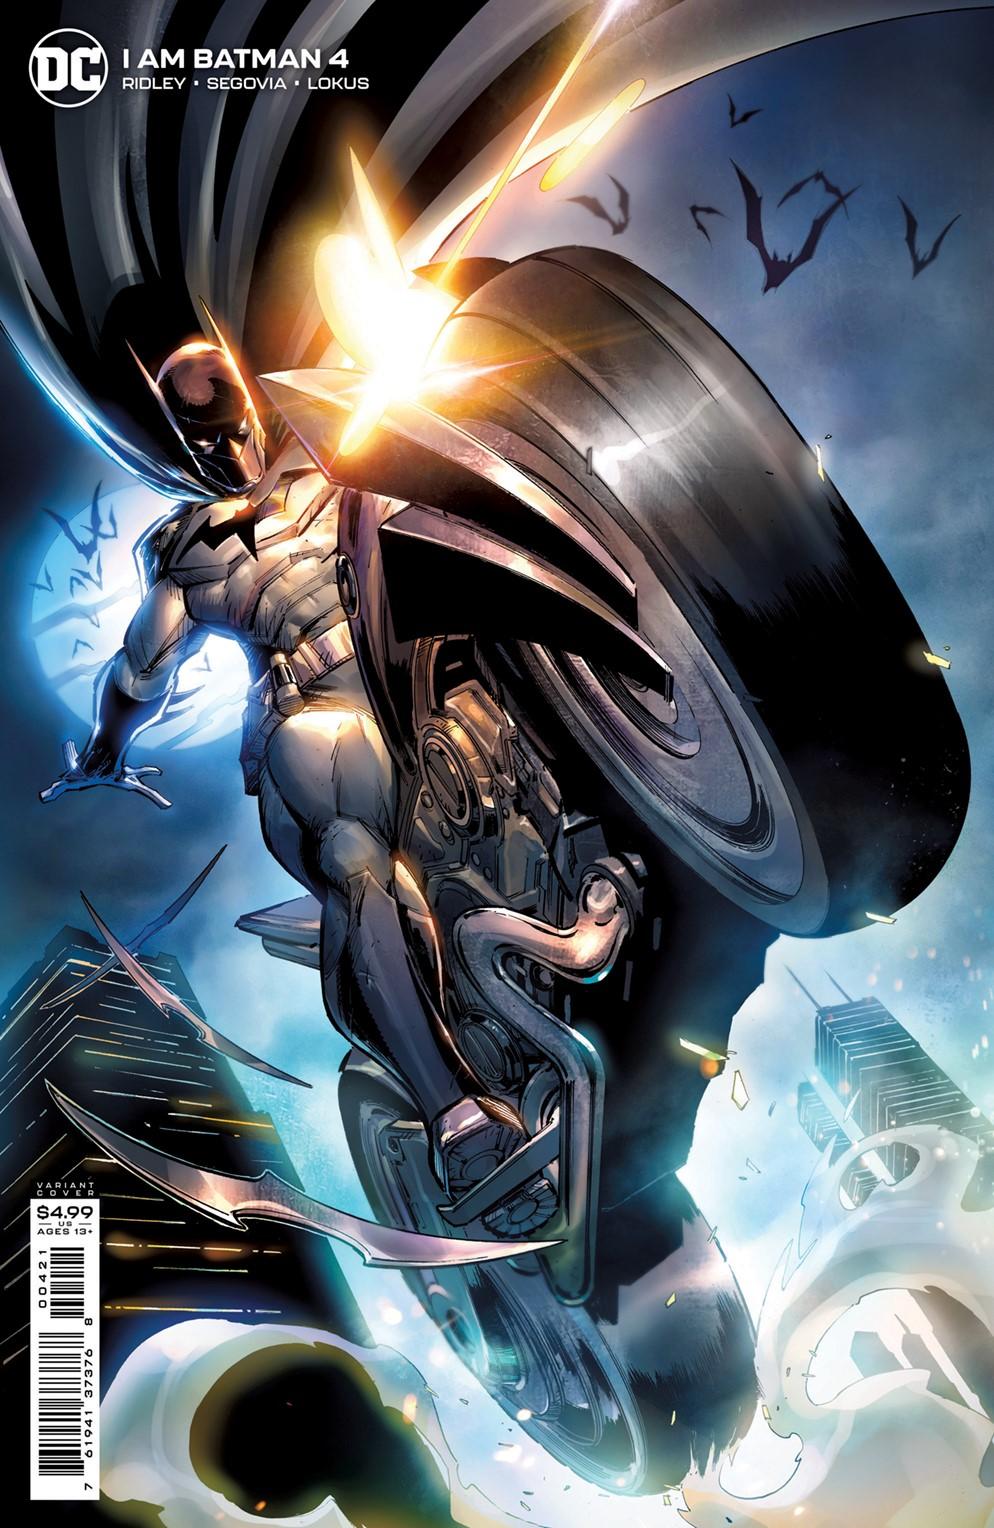 IAMBM_Cv4_var DC Comics December 2021 Solicitations